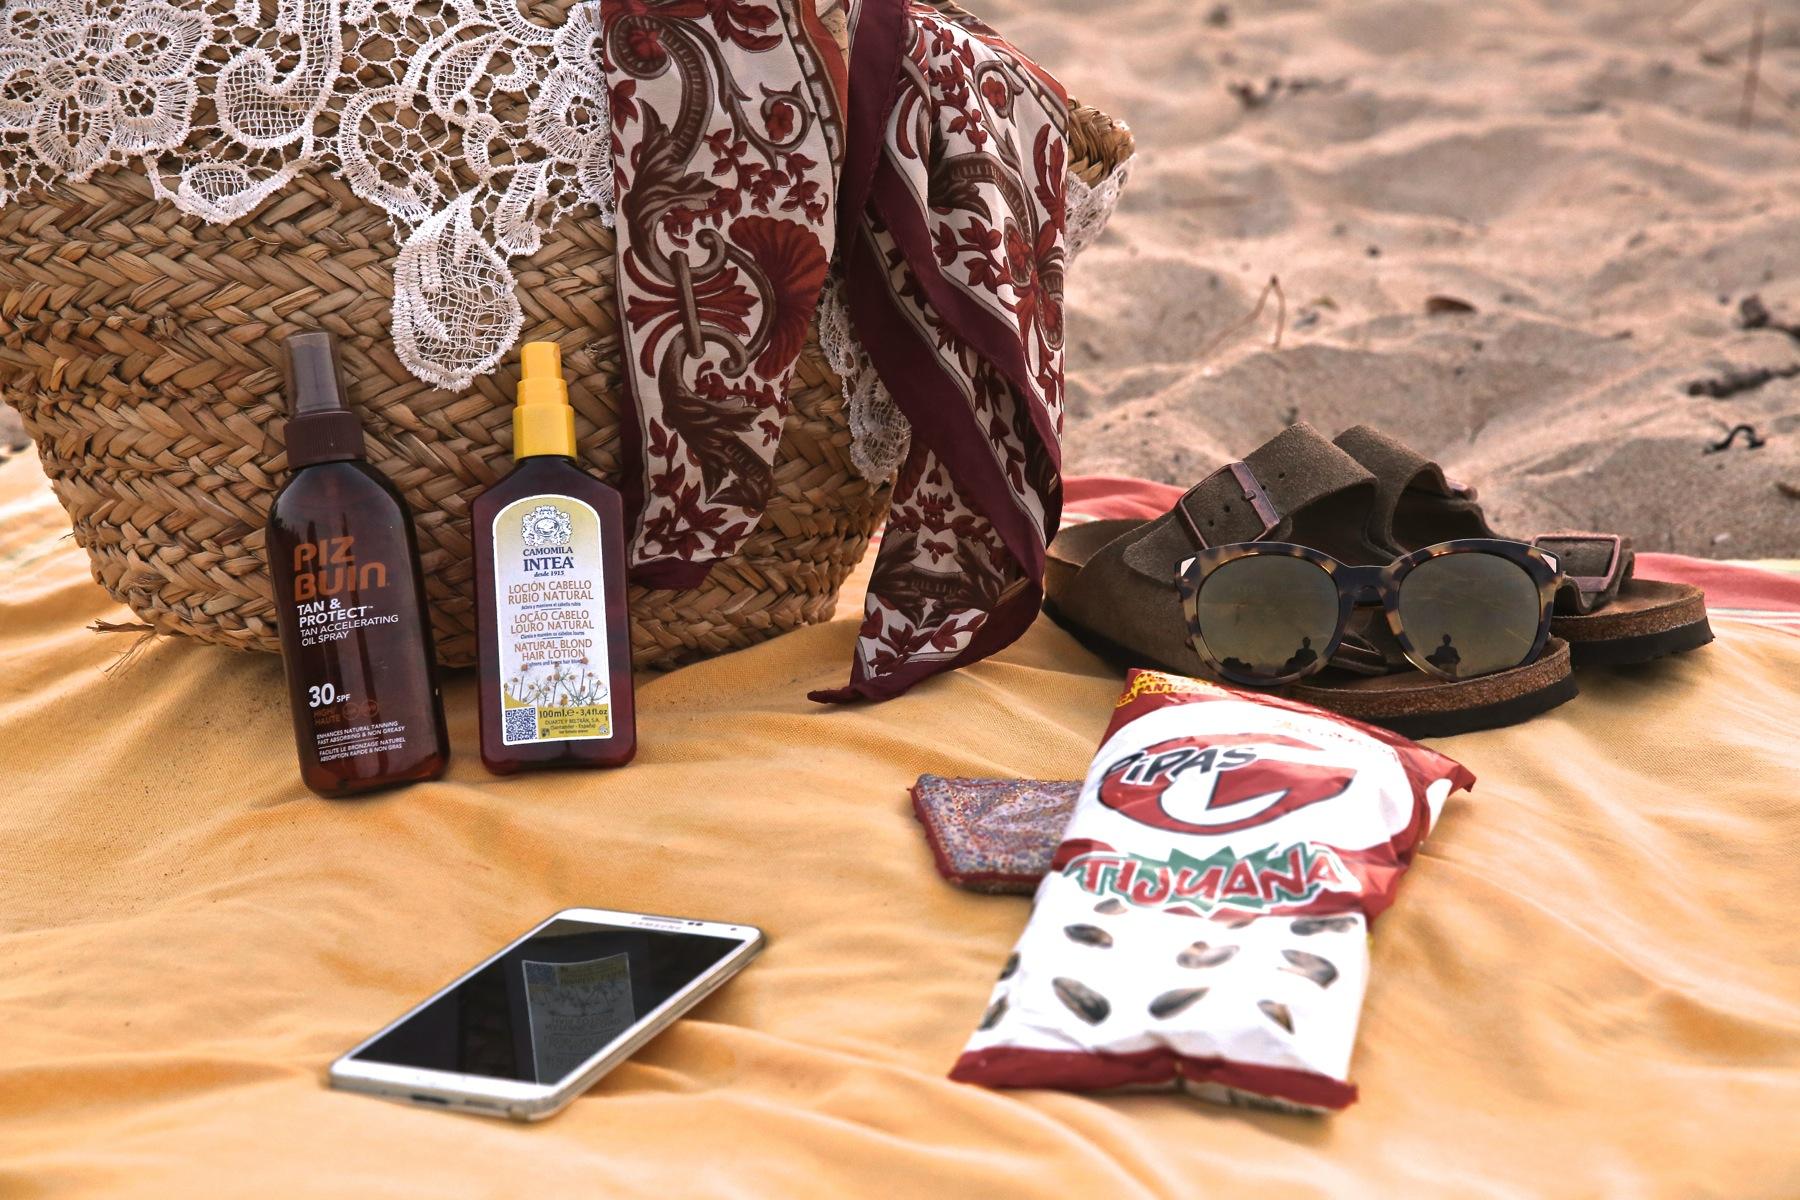 trendy_taste-look-outfit-street_style-boho-ootd-blog-blogger-fashion_spain-moda_españa-verano-crochet-vestido-bikini-hippie-dress-galicia-sunset-puesta_de_sol-piz_buin-4